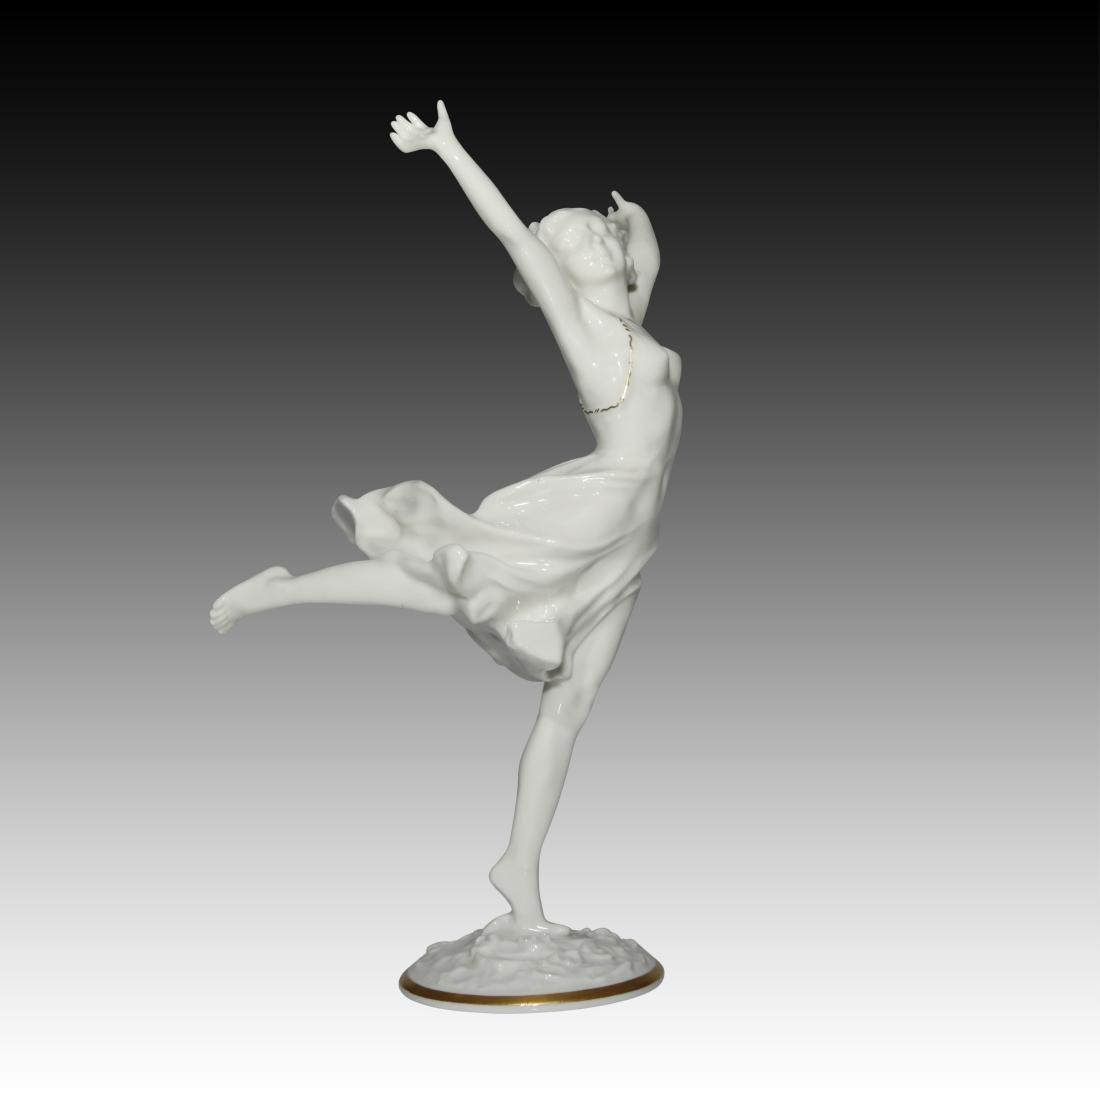 Hutschenreuther Art Deco Figurine Dancing - 2